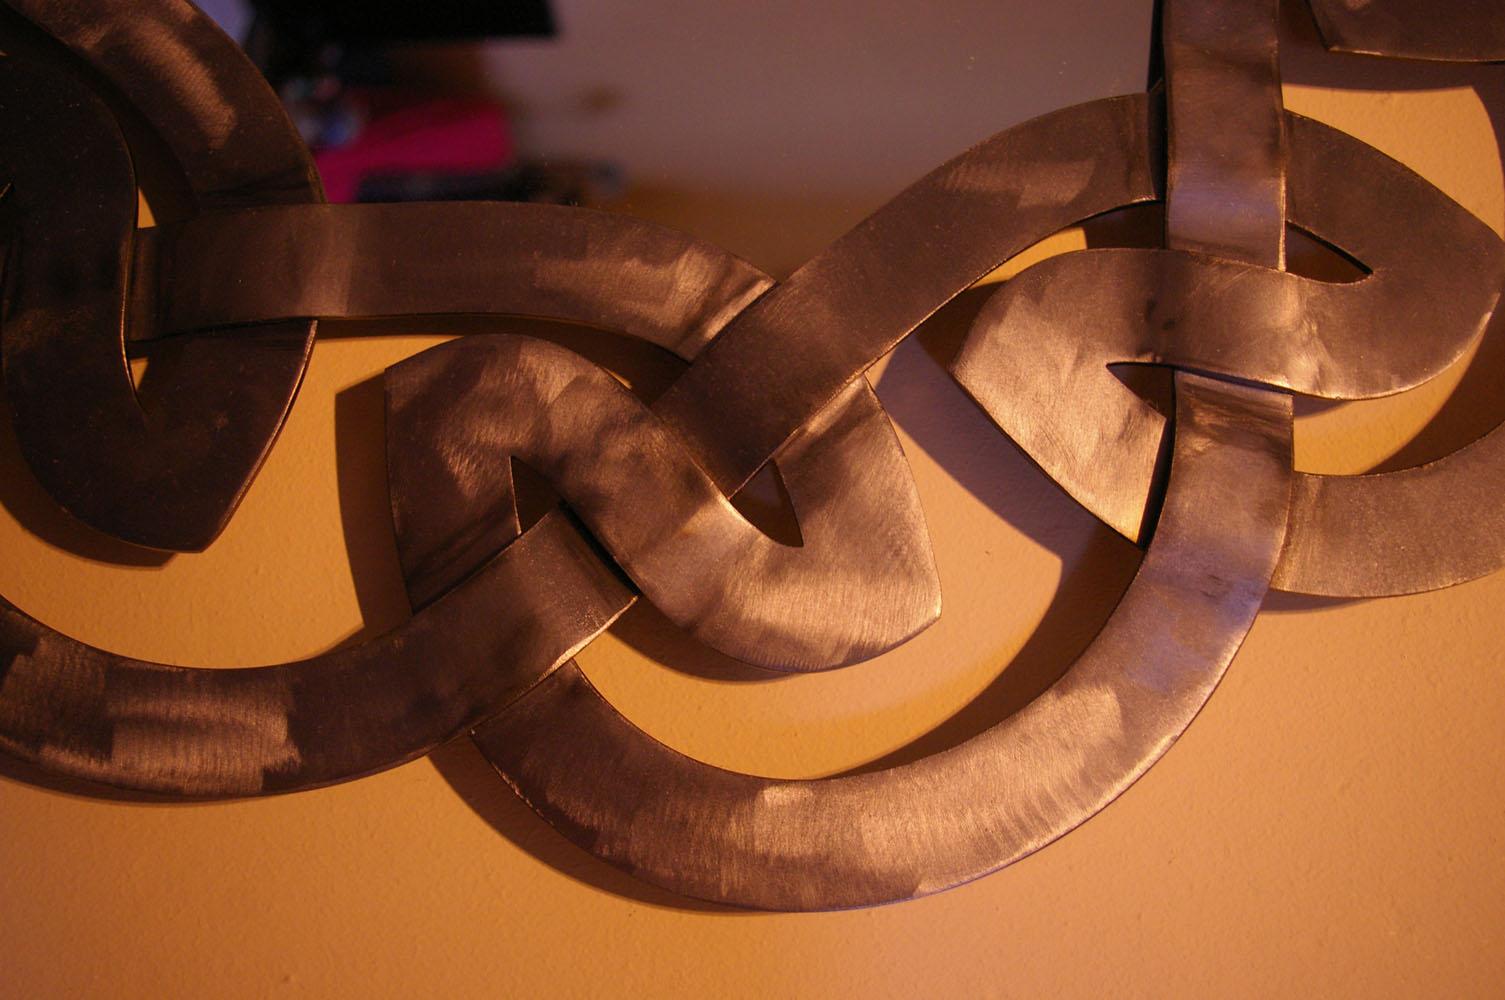 Celtic mirror - detail